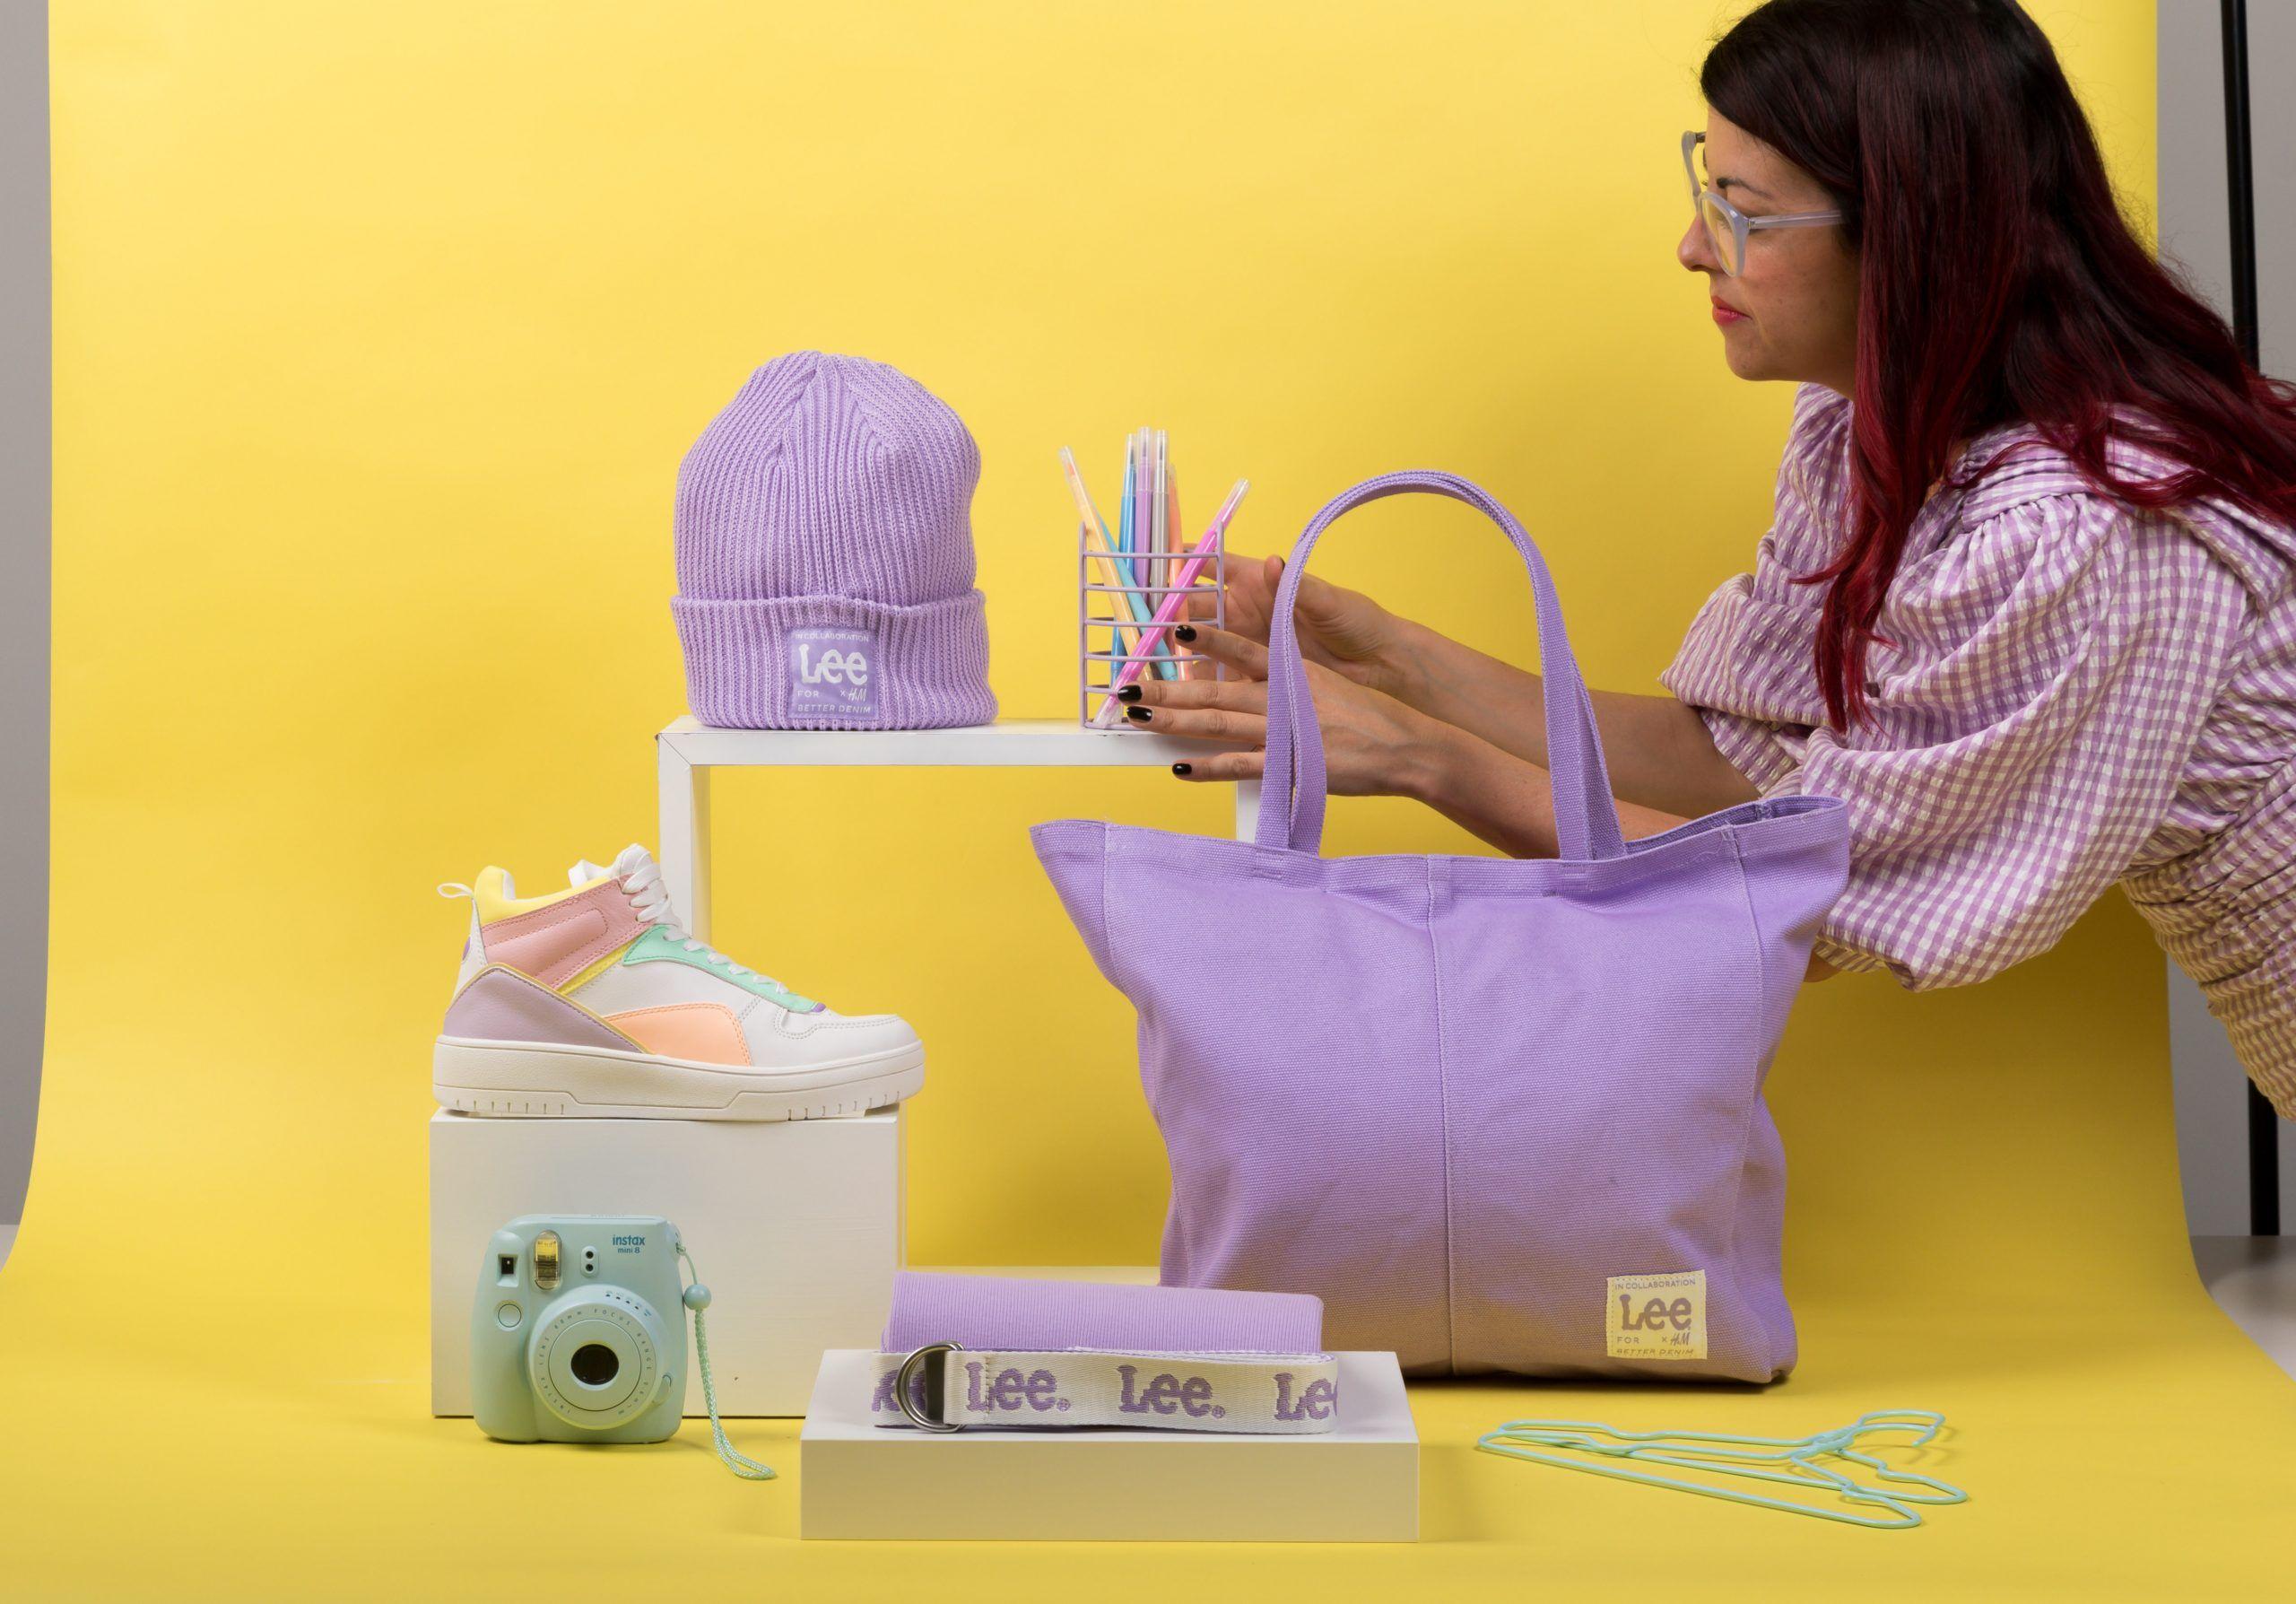 bodegón producto moda Lee x H&M fall winter collection 2021 4